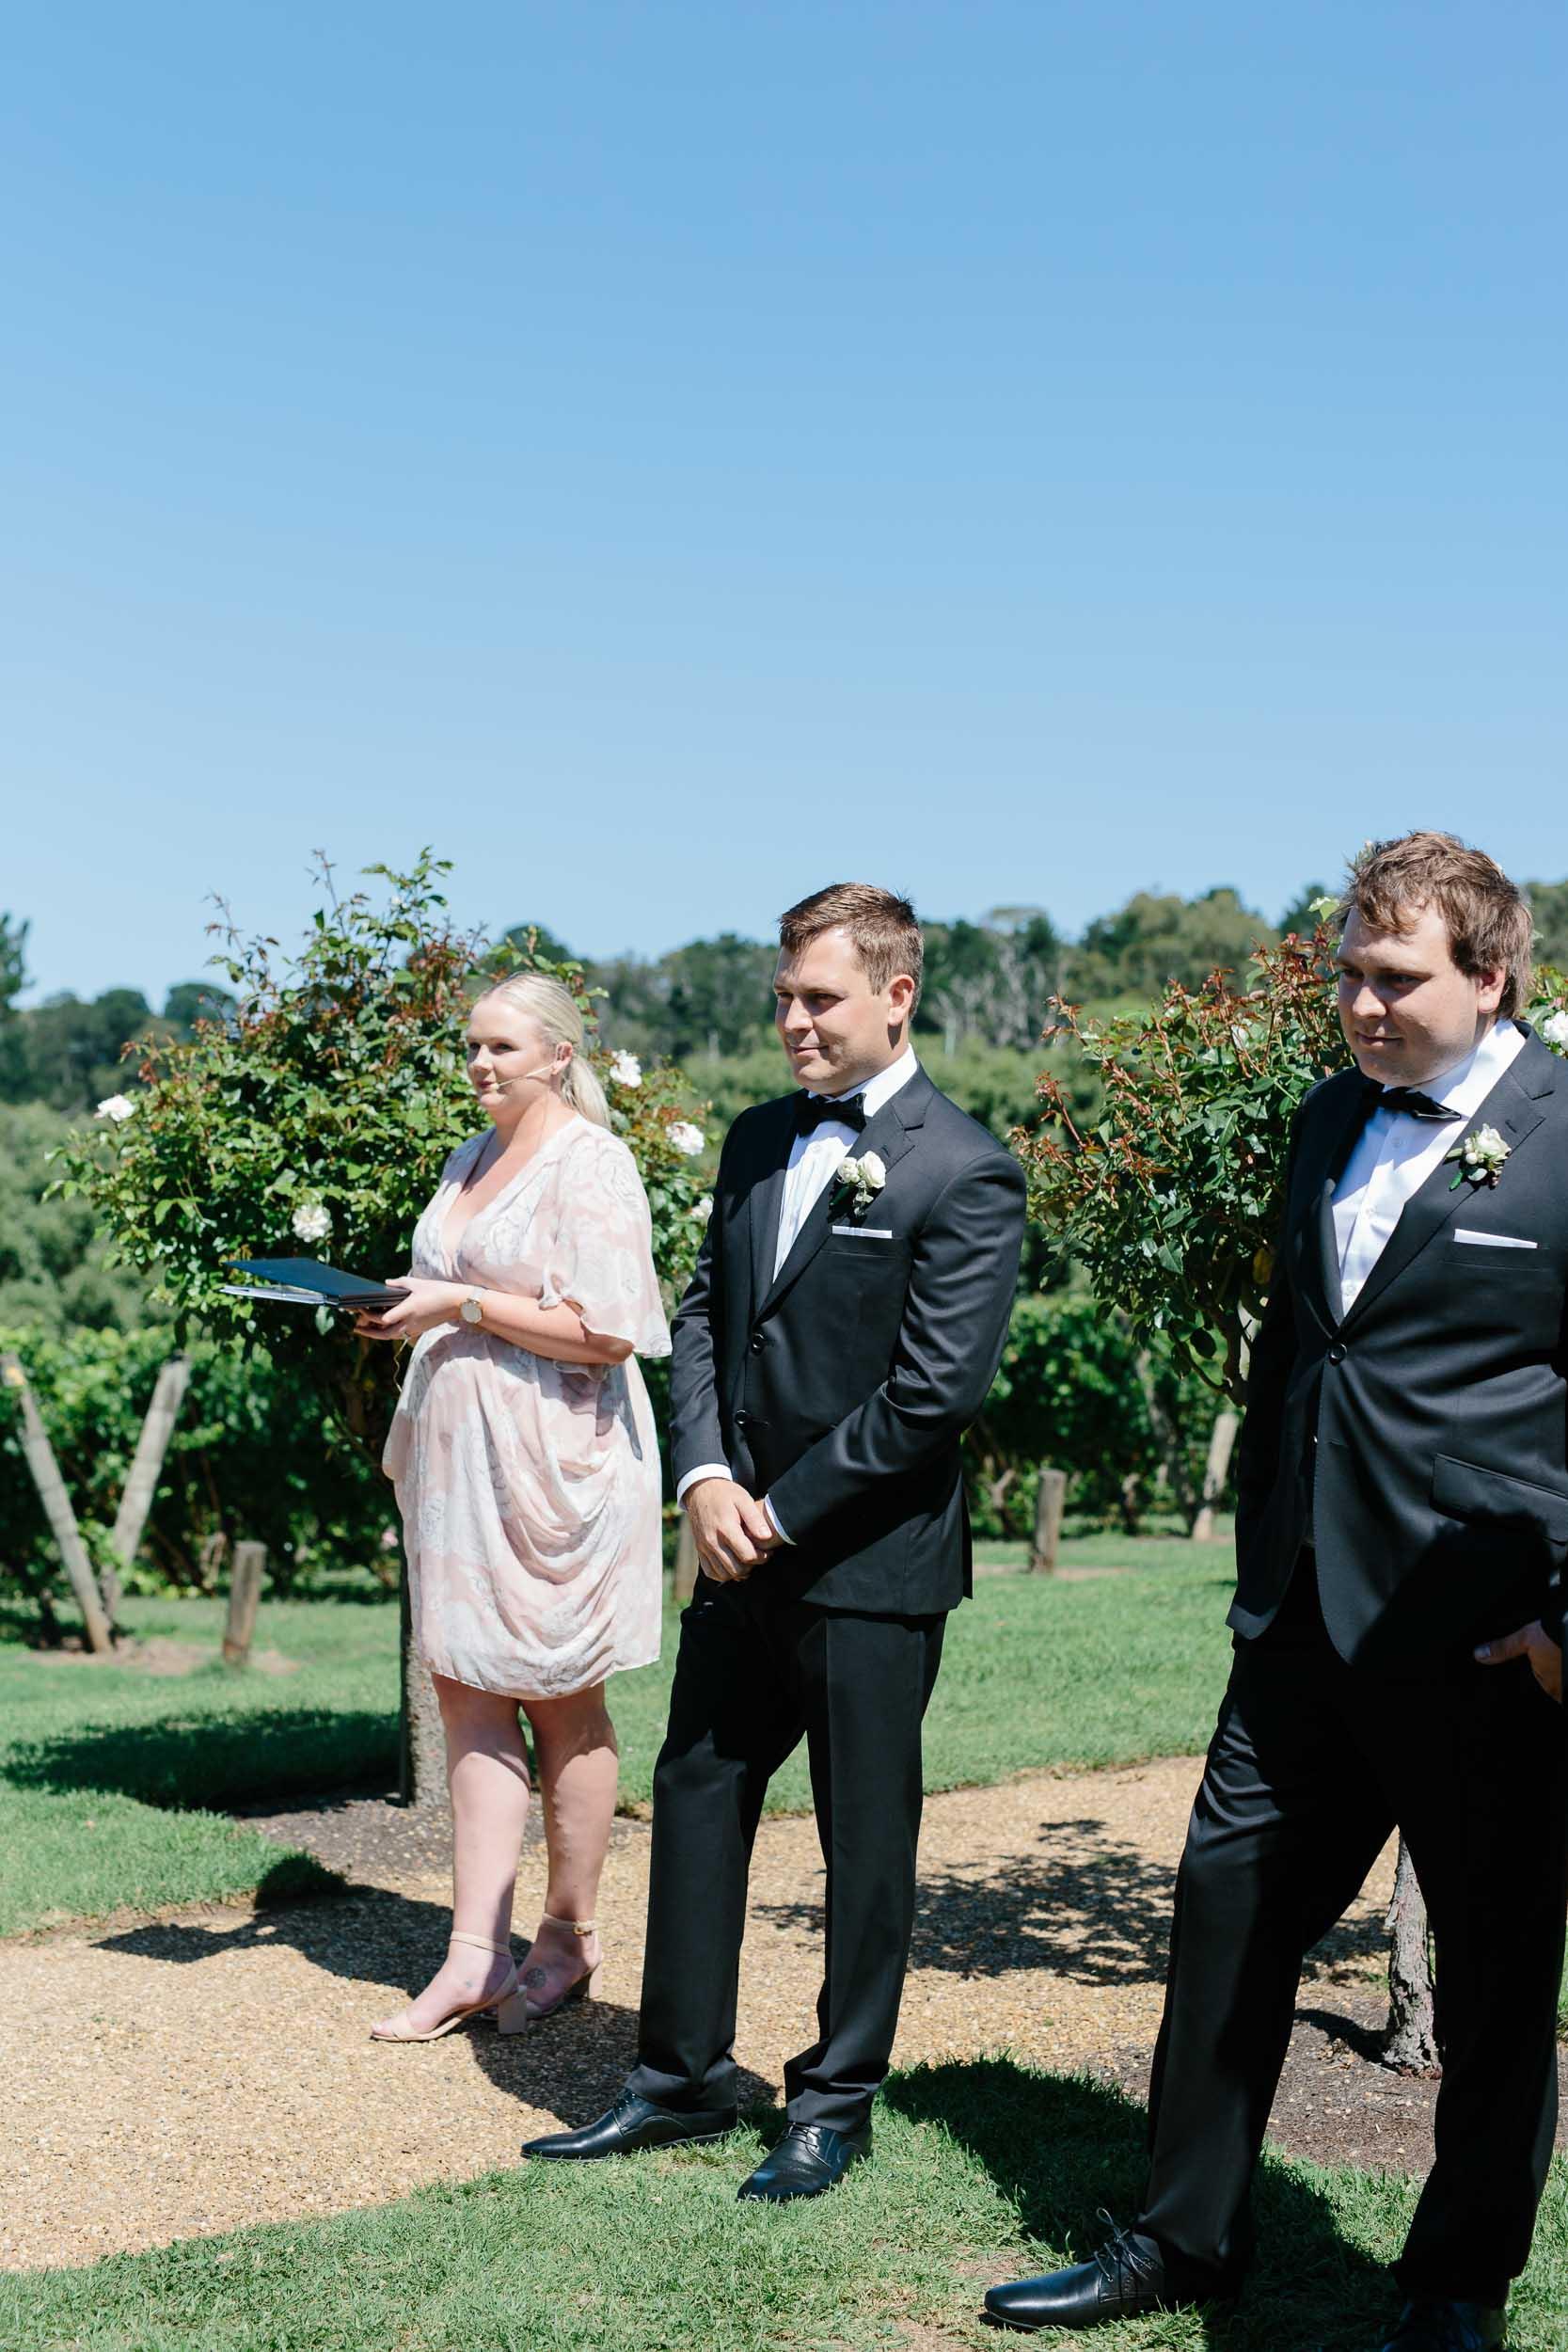 Kas-Richards-Mornington-Peninsula-Wedding-Lindenderry-Red-Hill-169.jpg